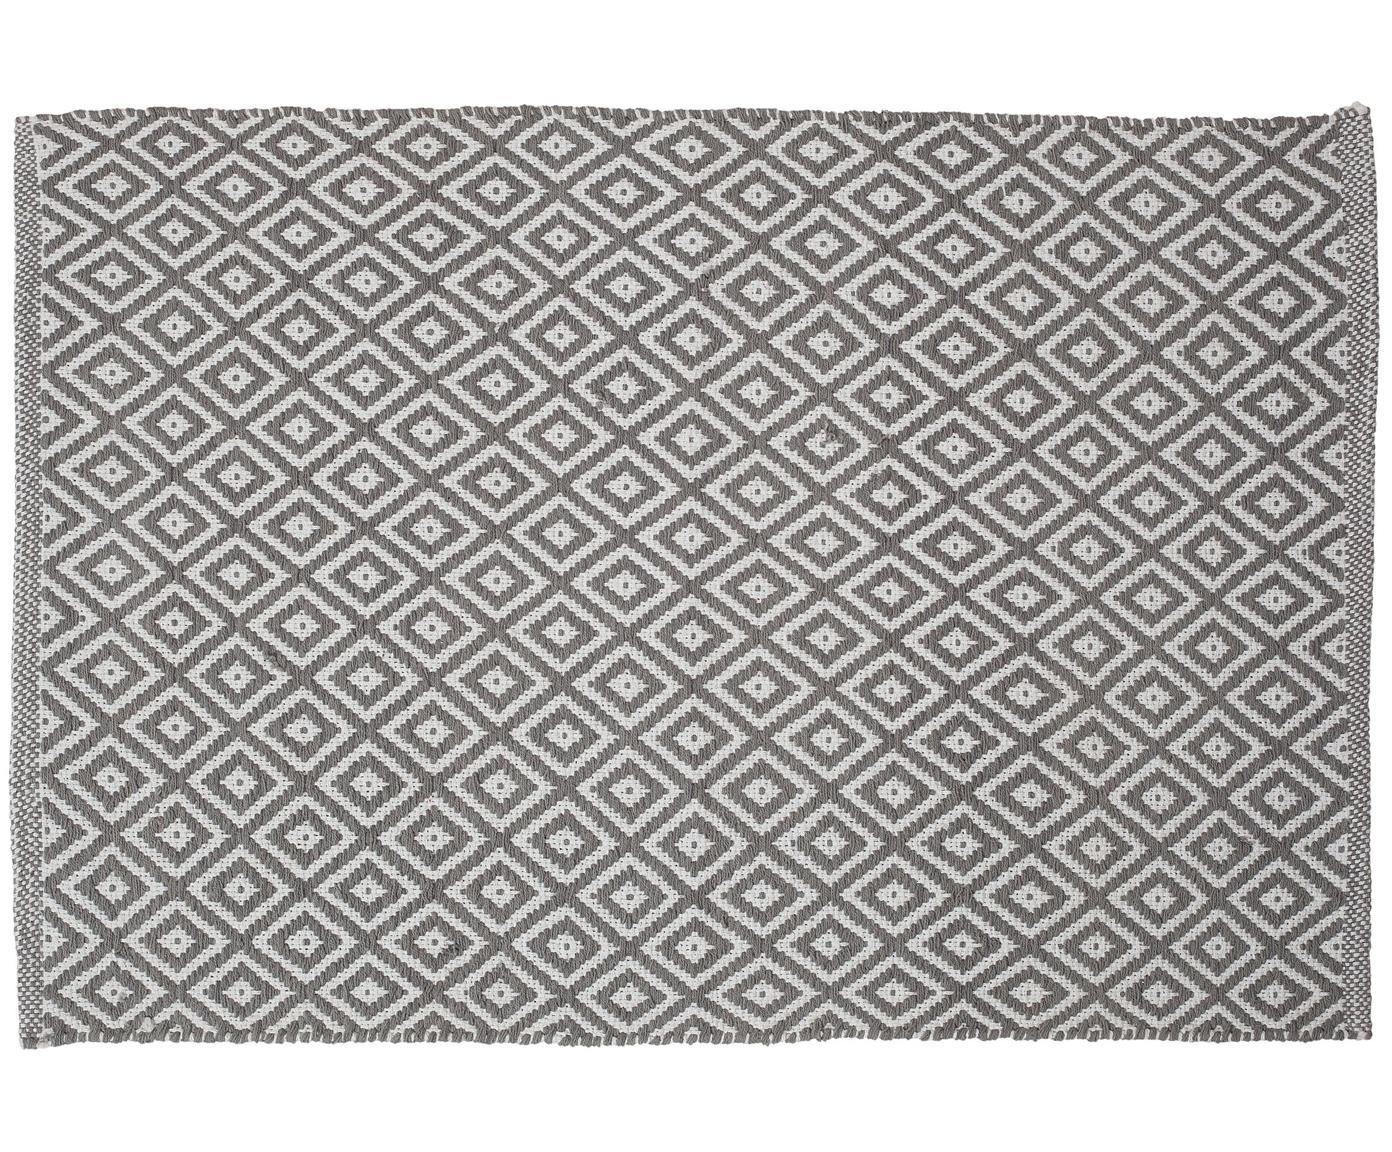 Alfombrilla de baño Erin, estilo boho, Algodón, Gris, blanco, An 60 x L 90 cm